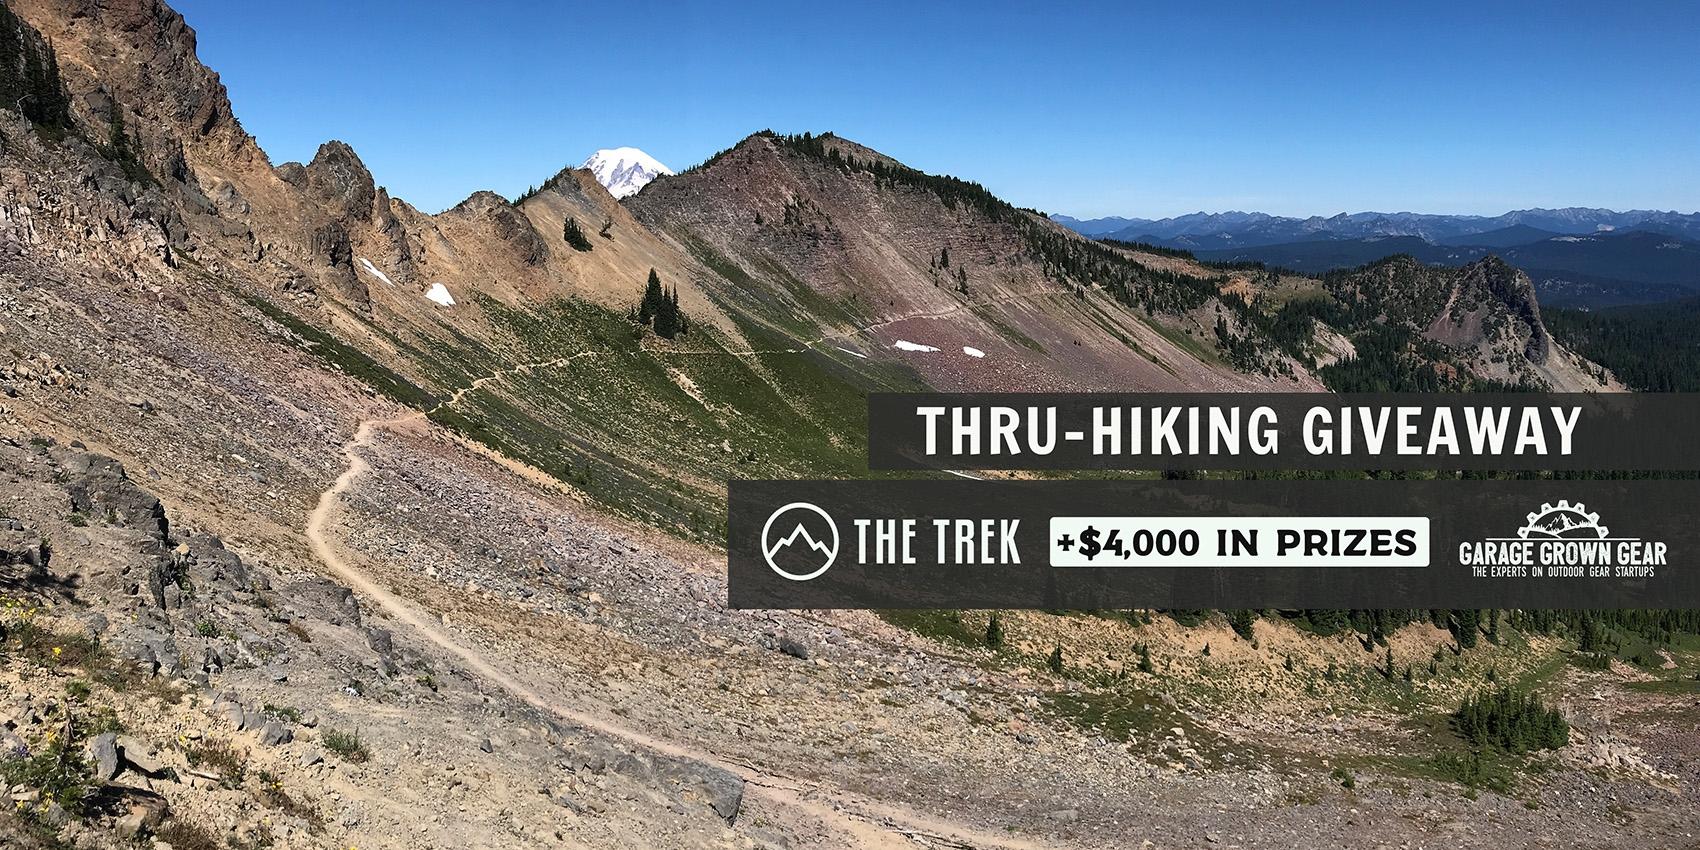 Hiking Giveaway!